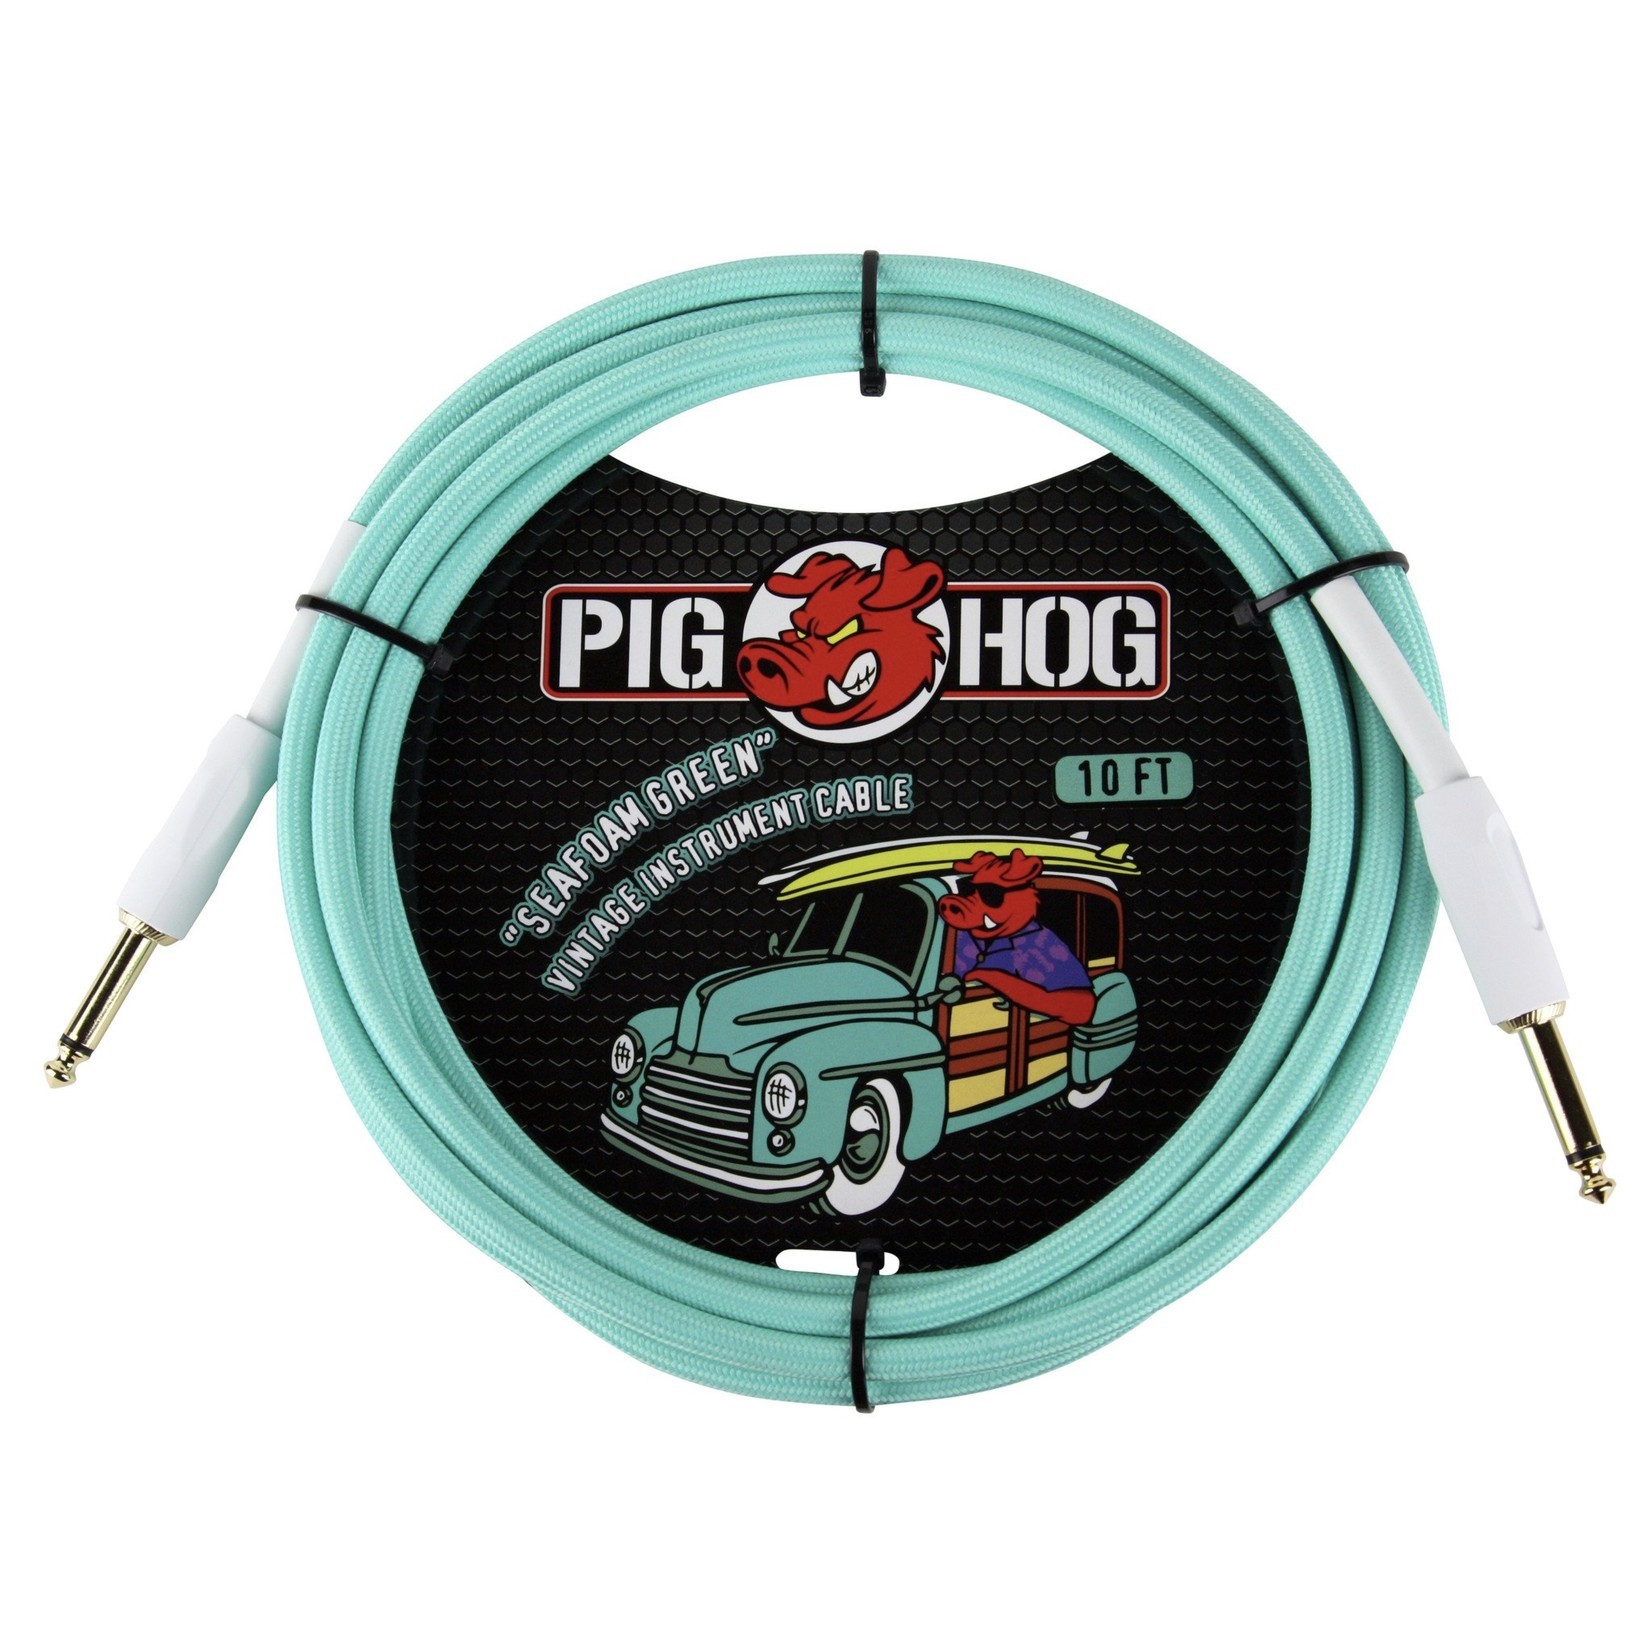 "Pig Hog Pig Hog ""Seafoam Green"" Vintage Woven Instrument Cable - 10 FT Straight 1/4"" Plugs (PCH10SG)"